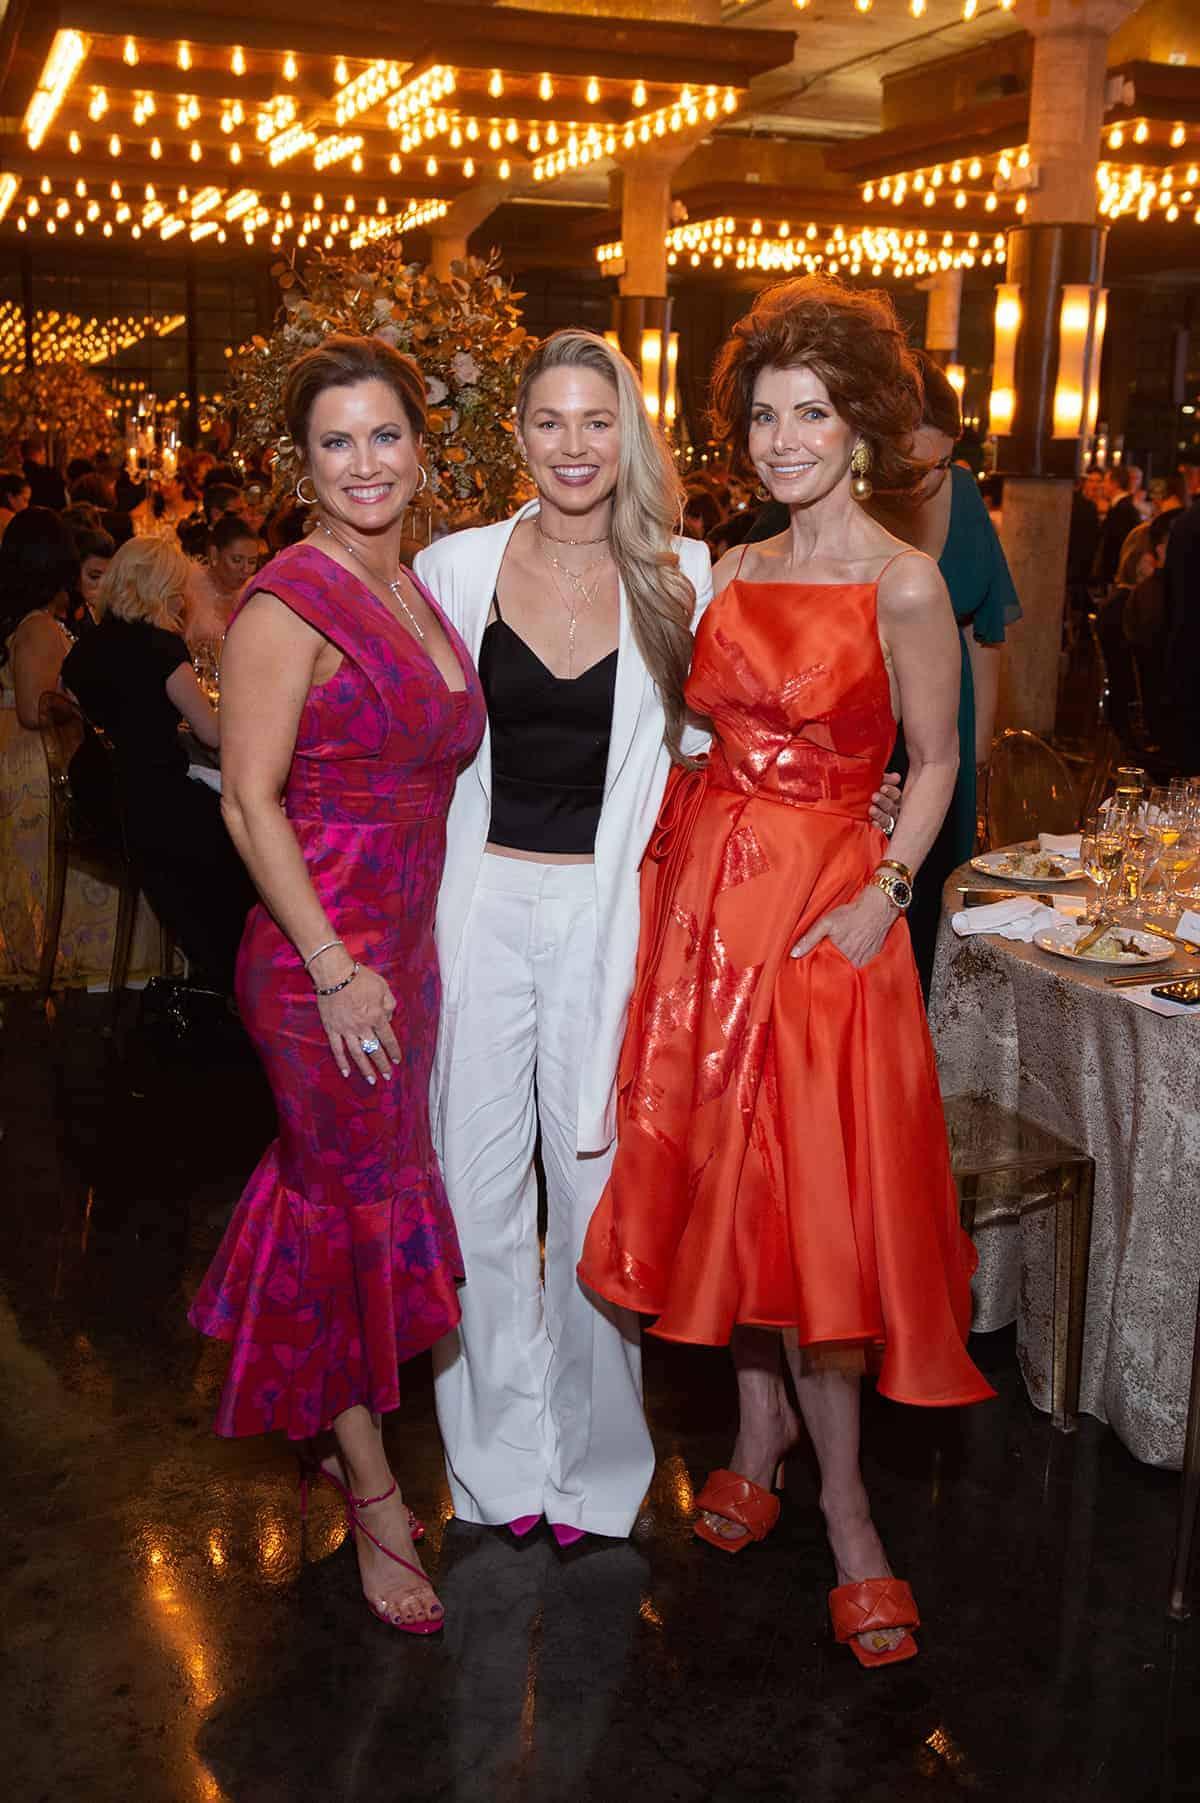 Christi Rawls, Allie LaForce and Marla Hurley